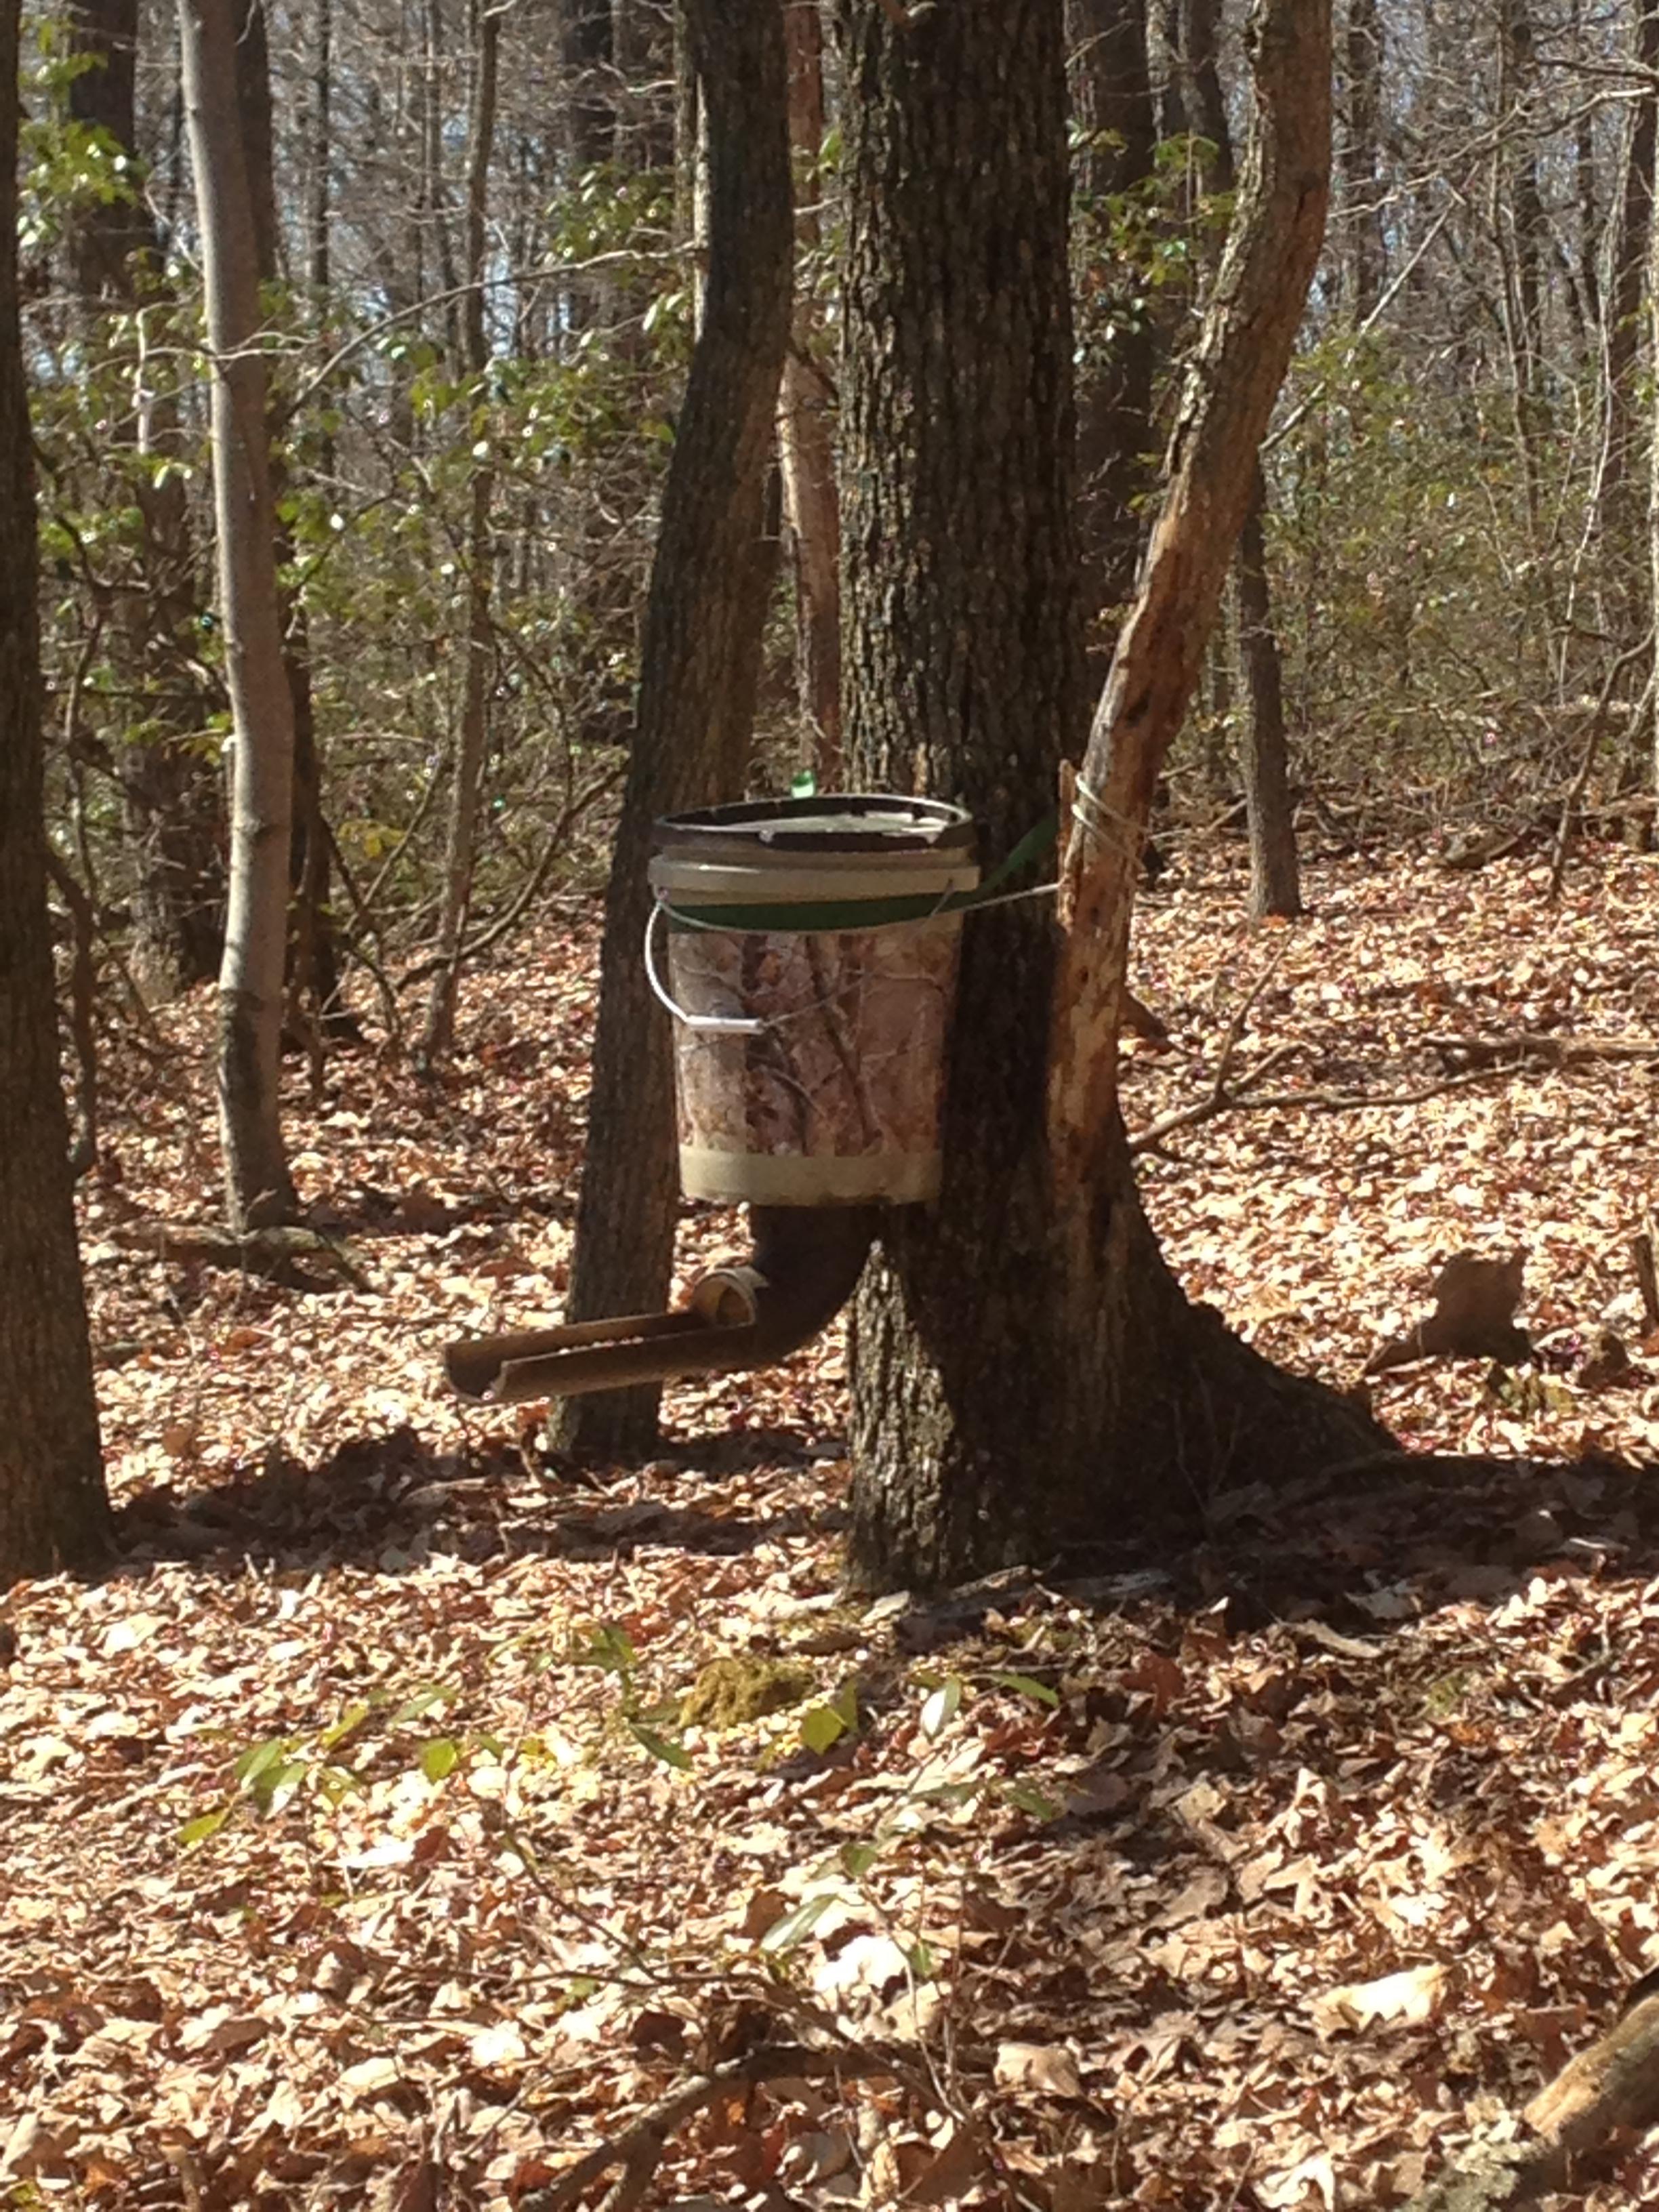 An illegal public land bait site in Pennsylvania.)